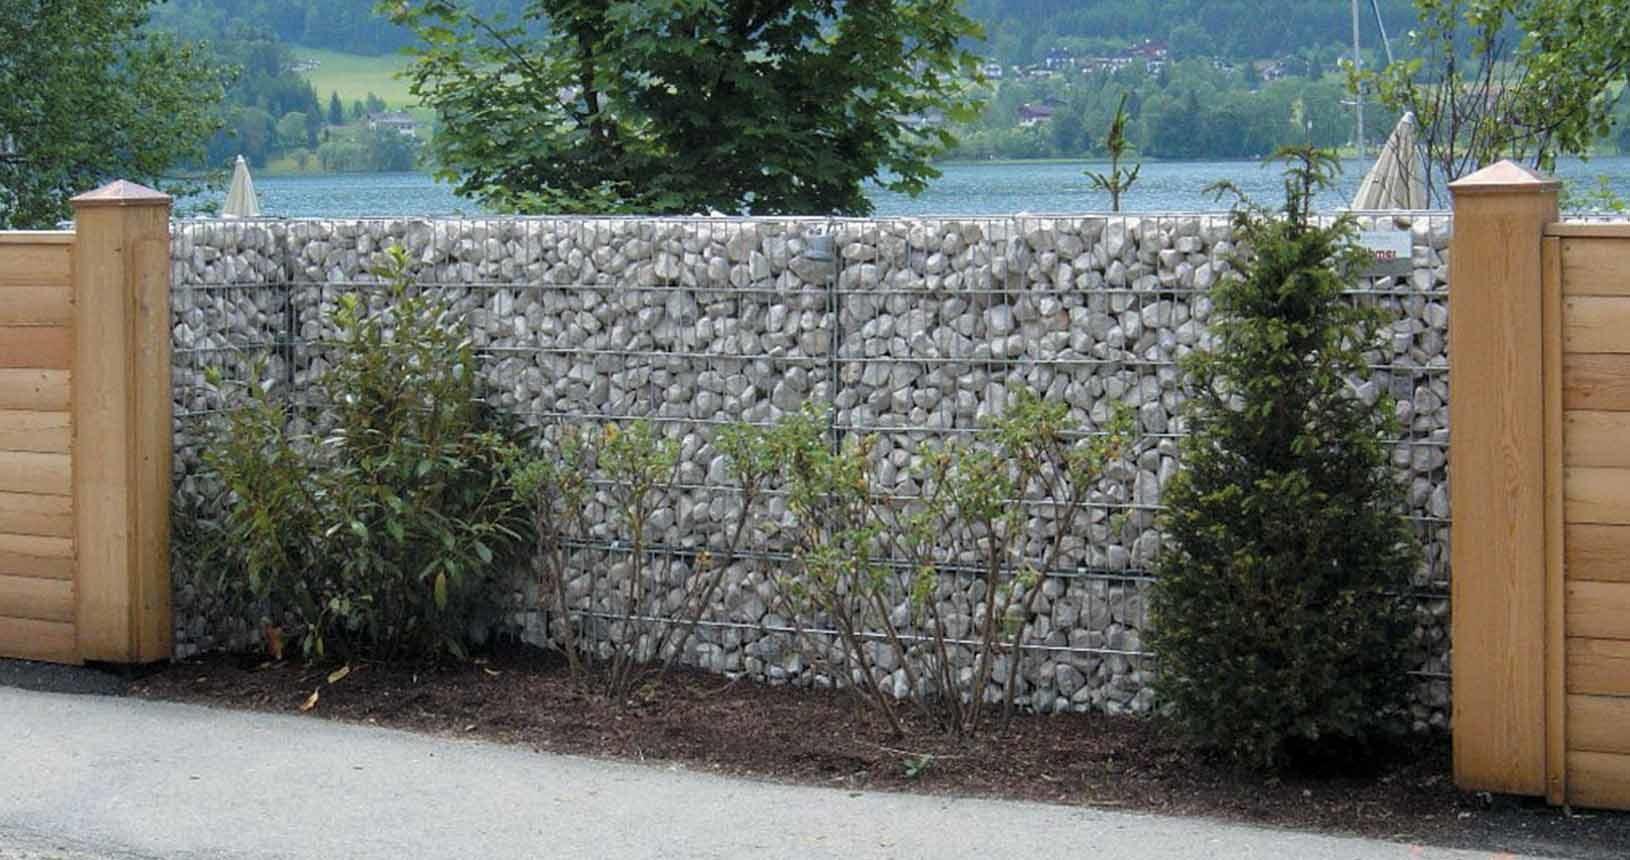 Annunci di giardino e fai da te in vendita a ravenna e provincia: Giardino Faro Due A Ravenna E Cervia